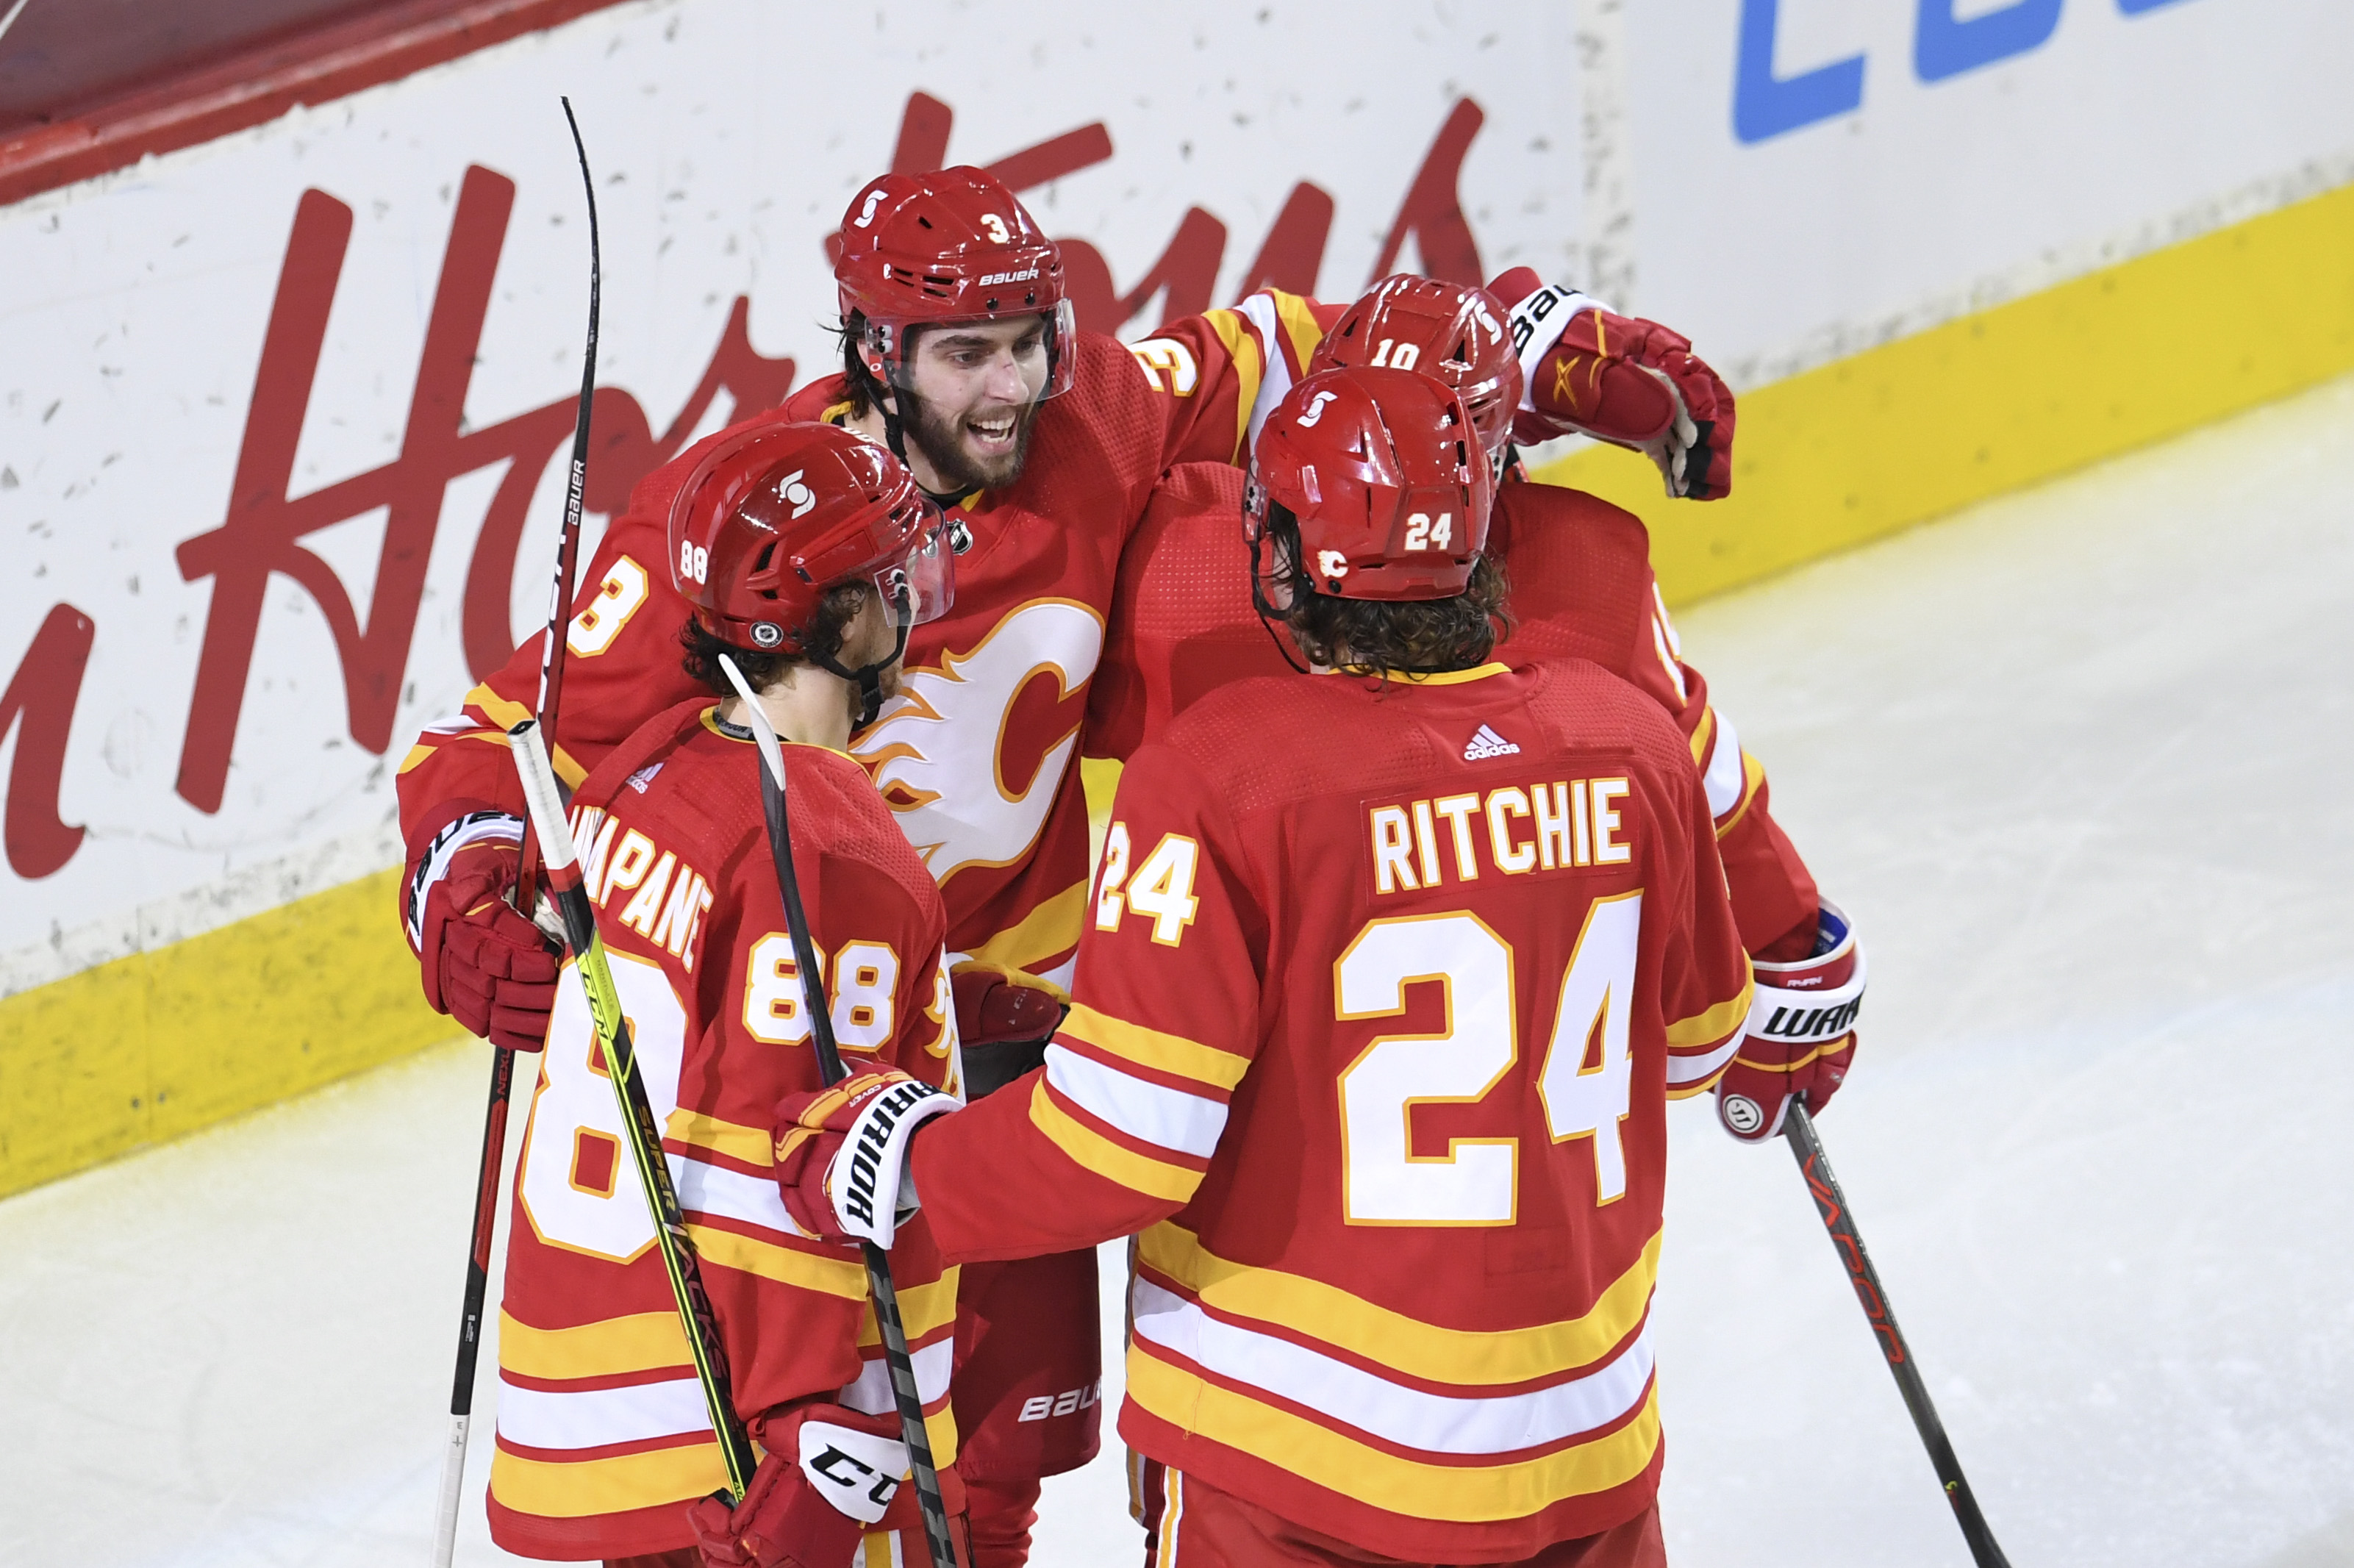 Calgary, Alberta, CAN; Calgary Flames defenseman Connor Mackey (3) celebrates his third period goal against the Vancouver Canucks at Scotiabank Saddledome. Flames won 6-2.